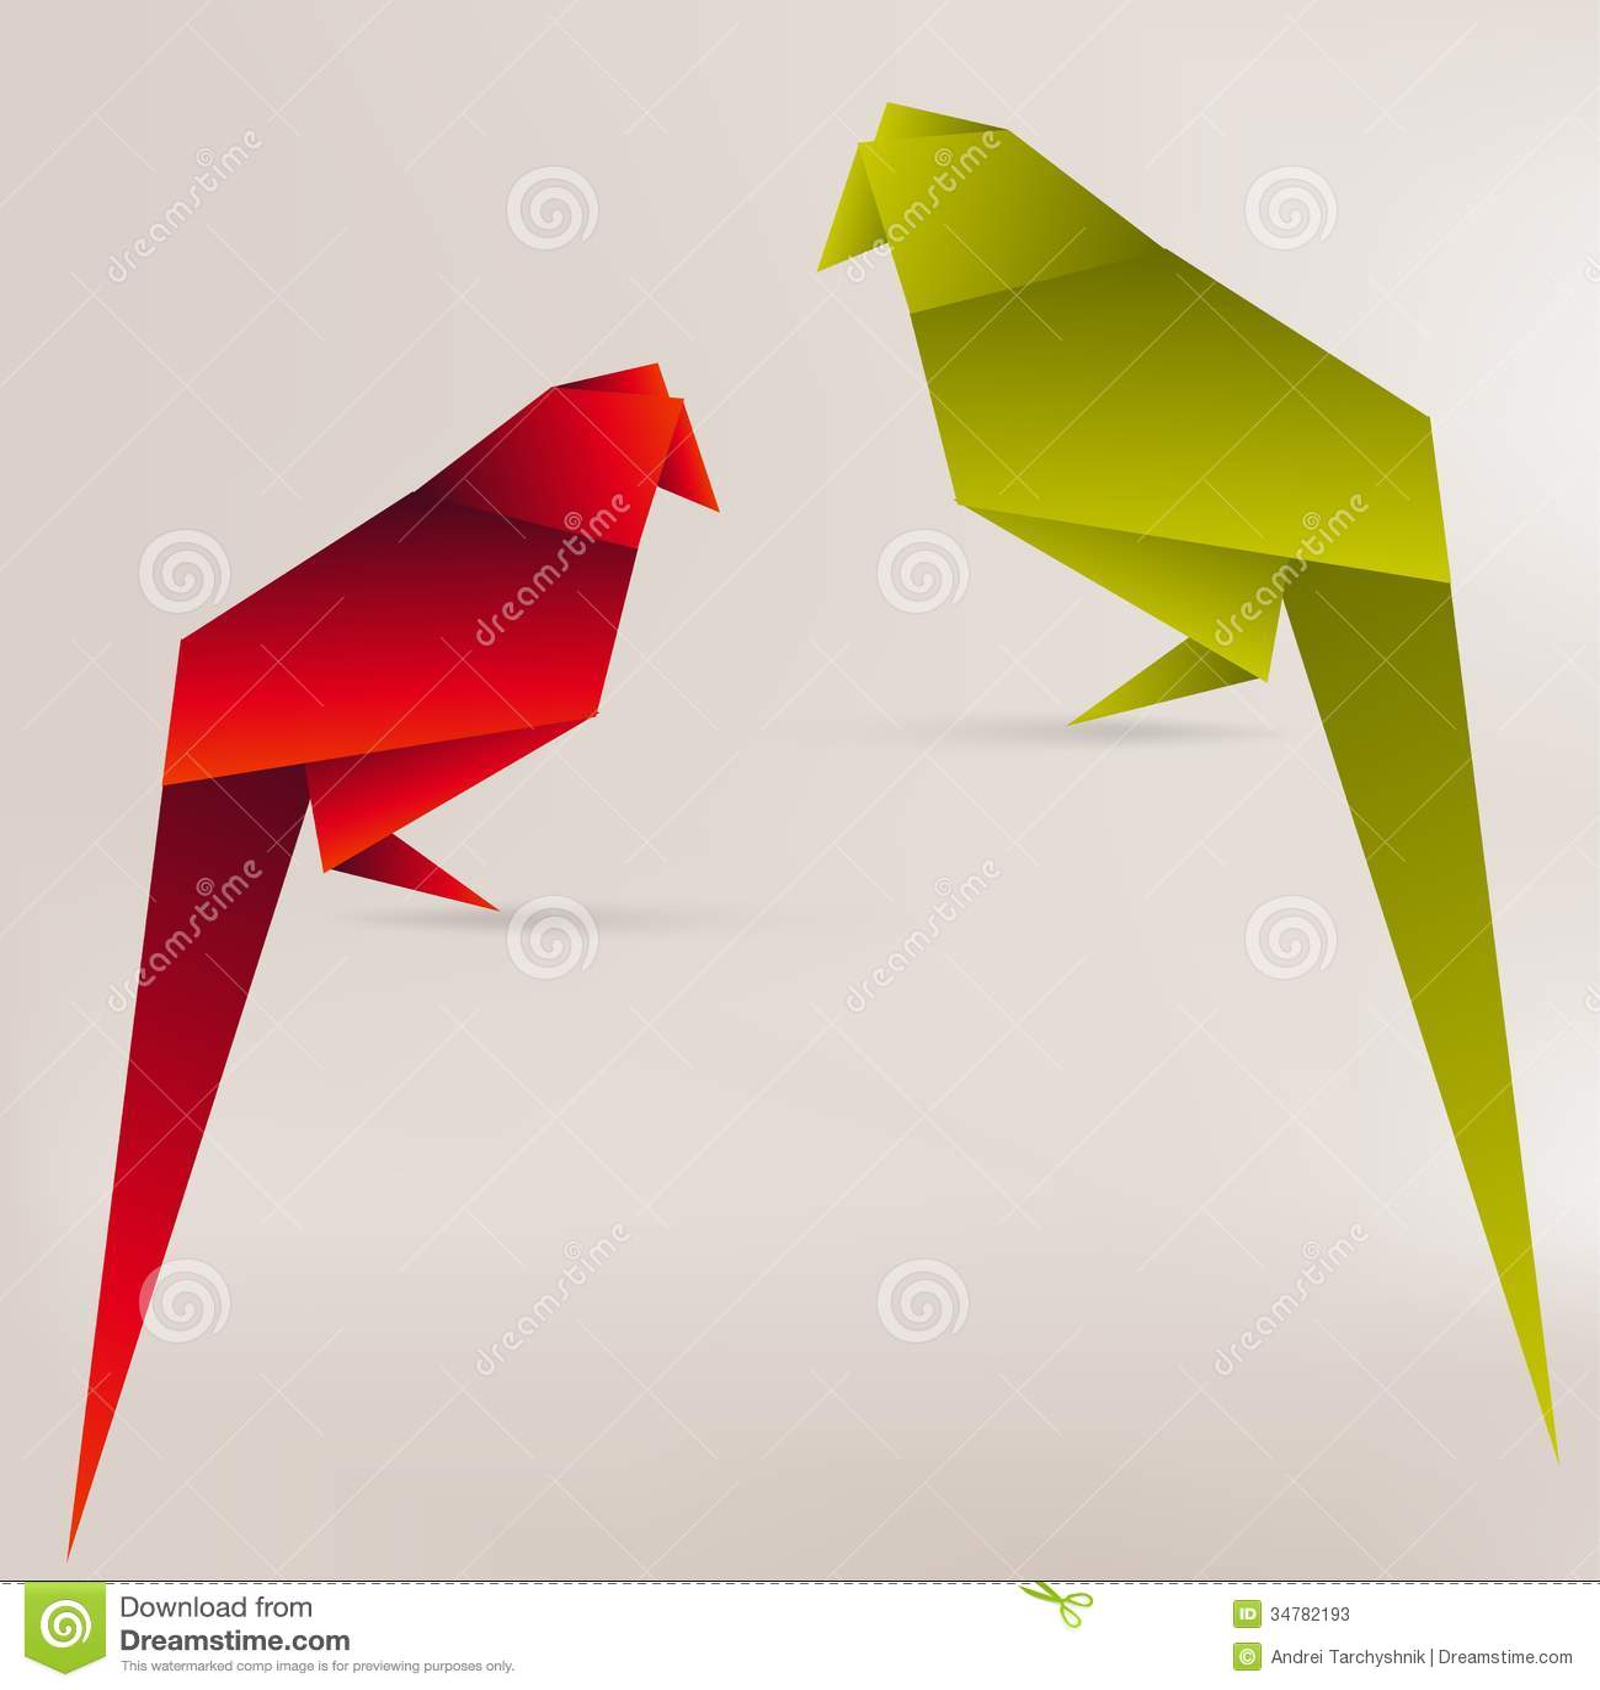 Essay on parrot